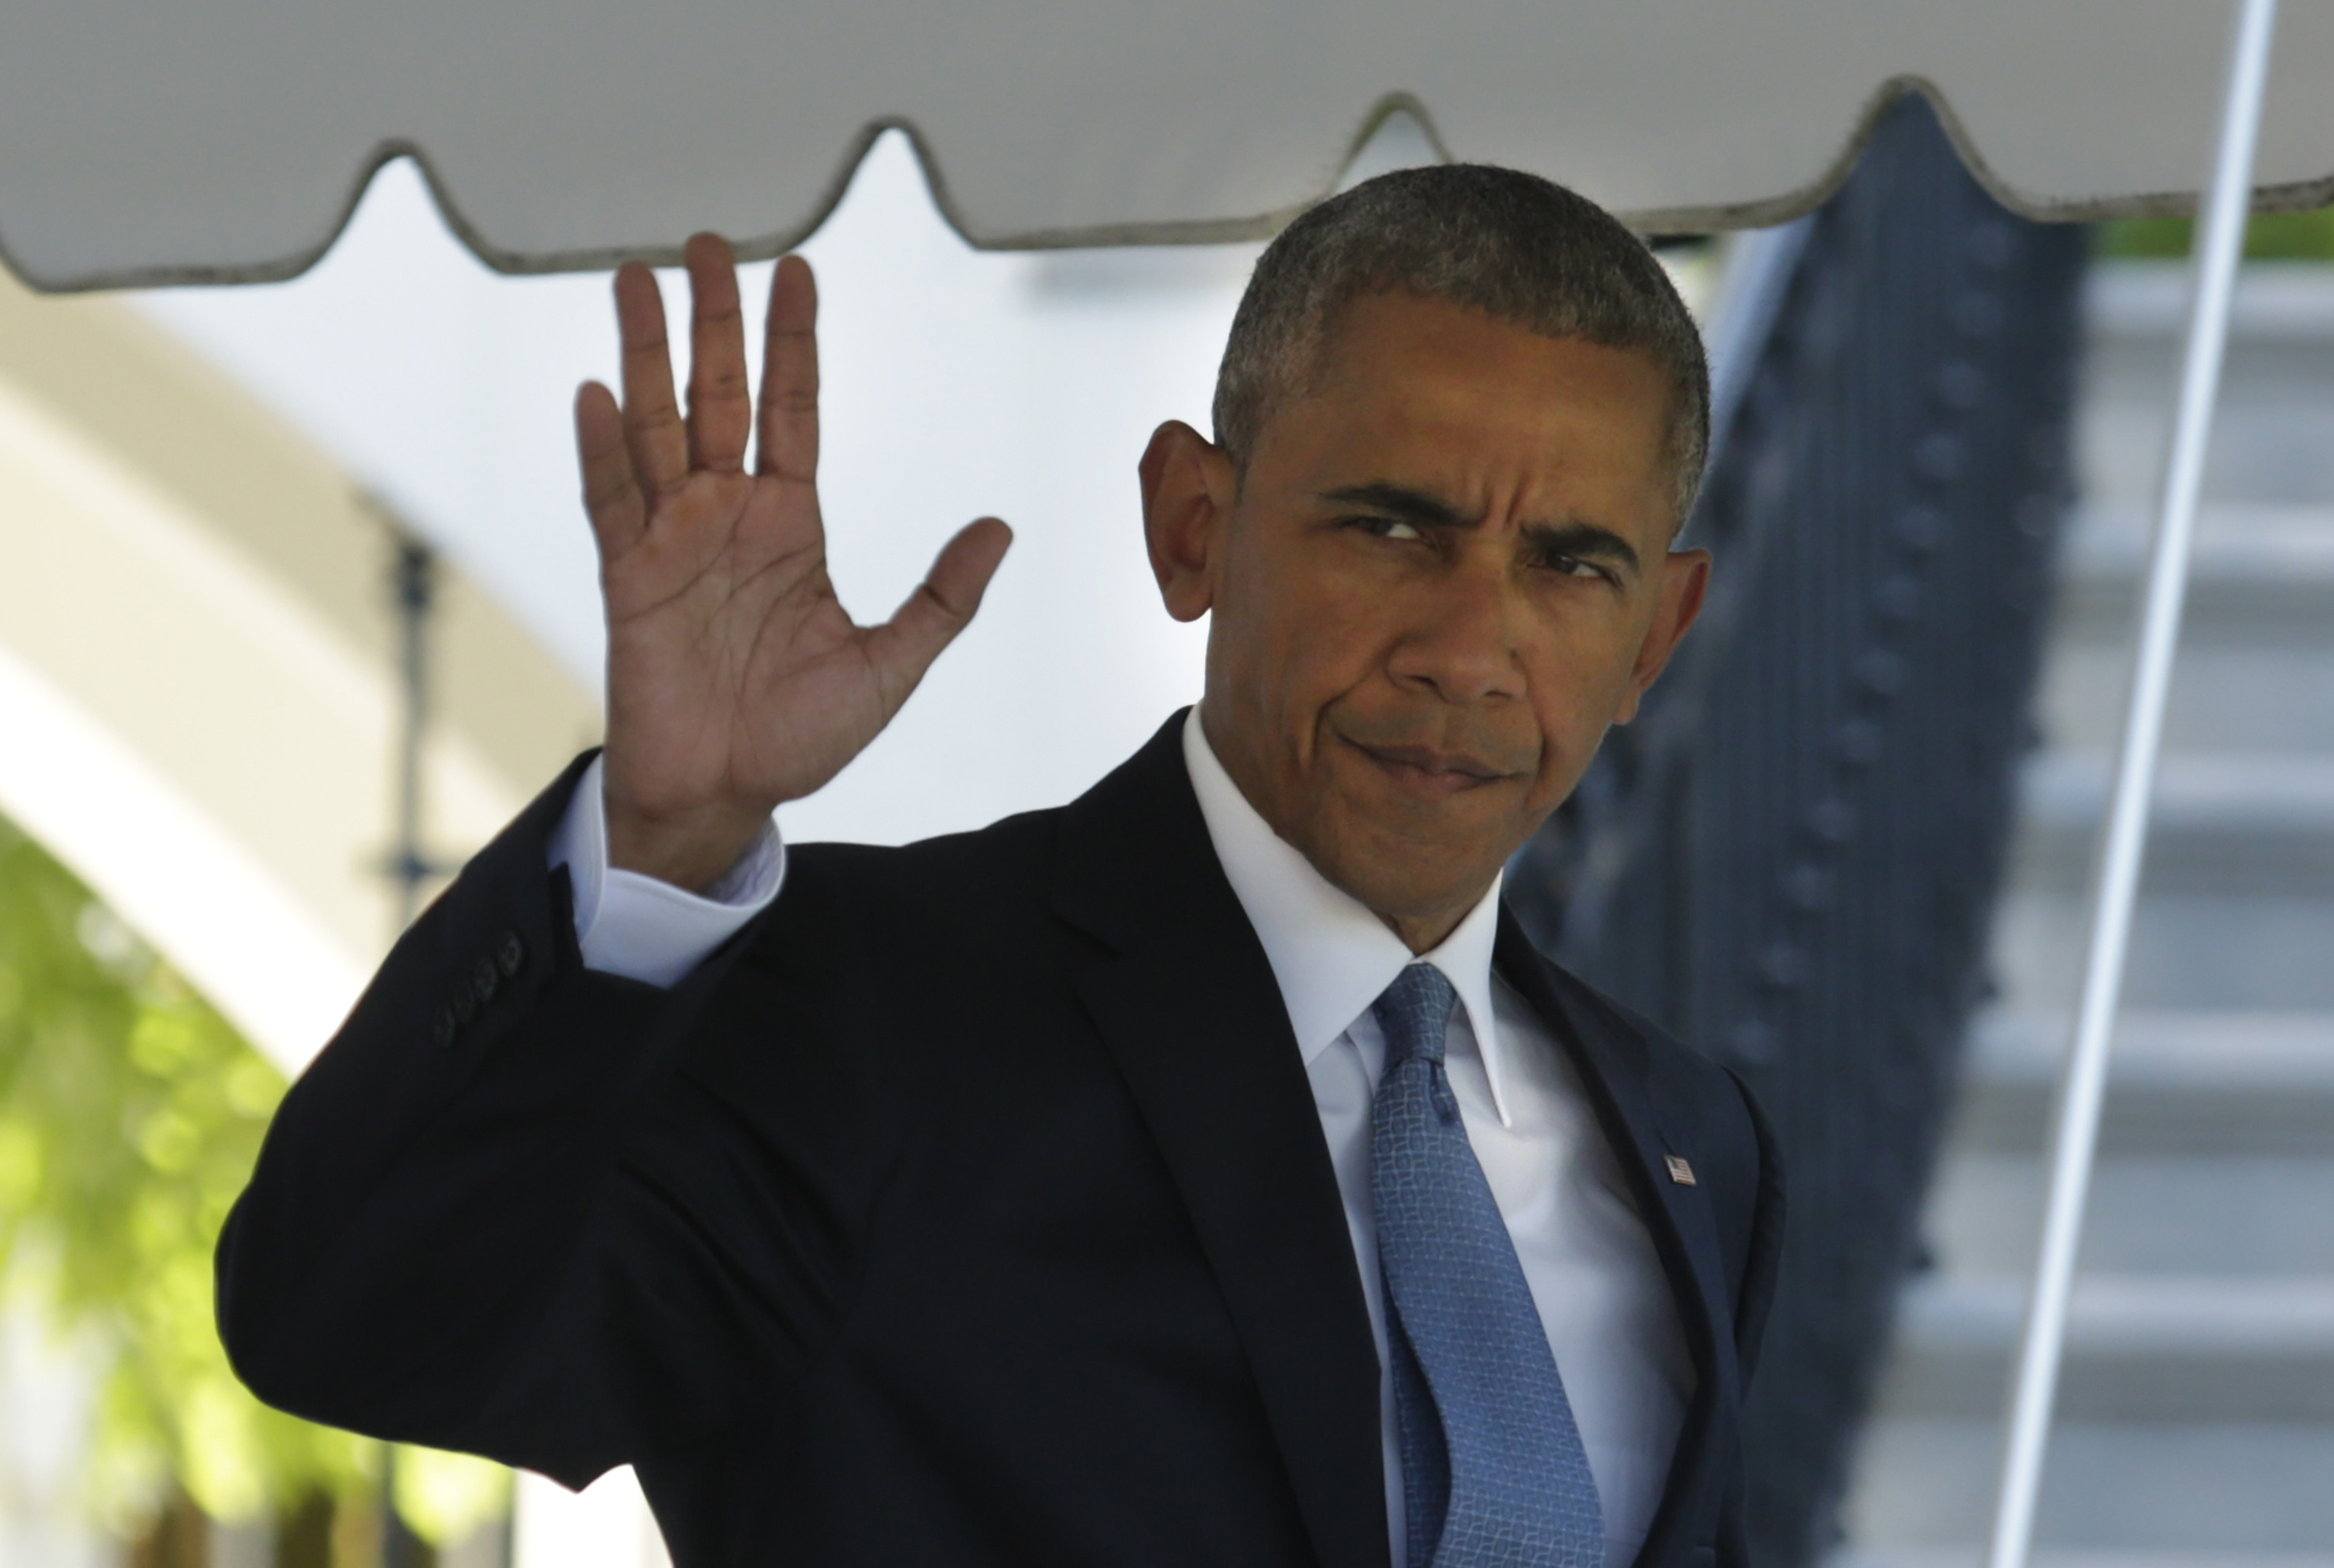 Barack Obama leaving the White House